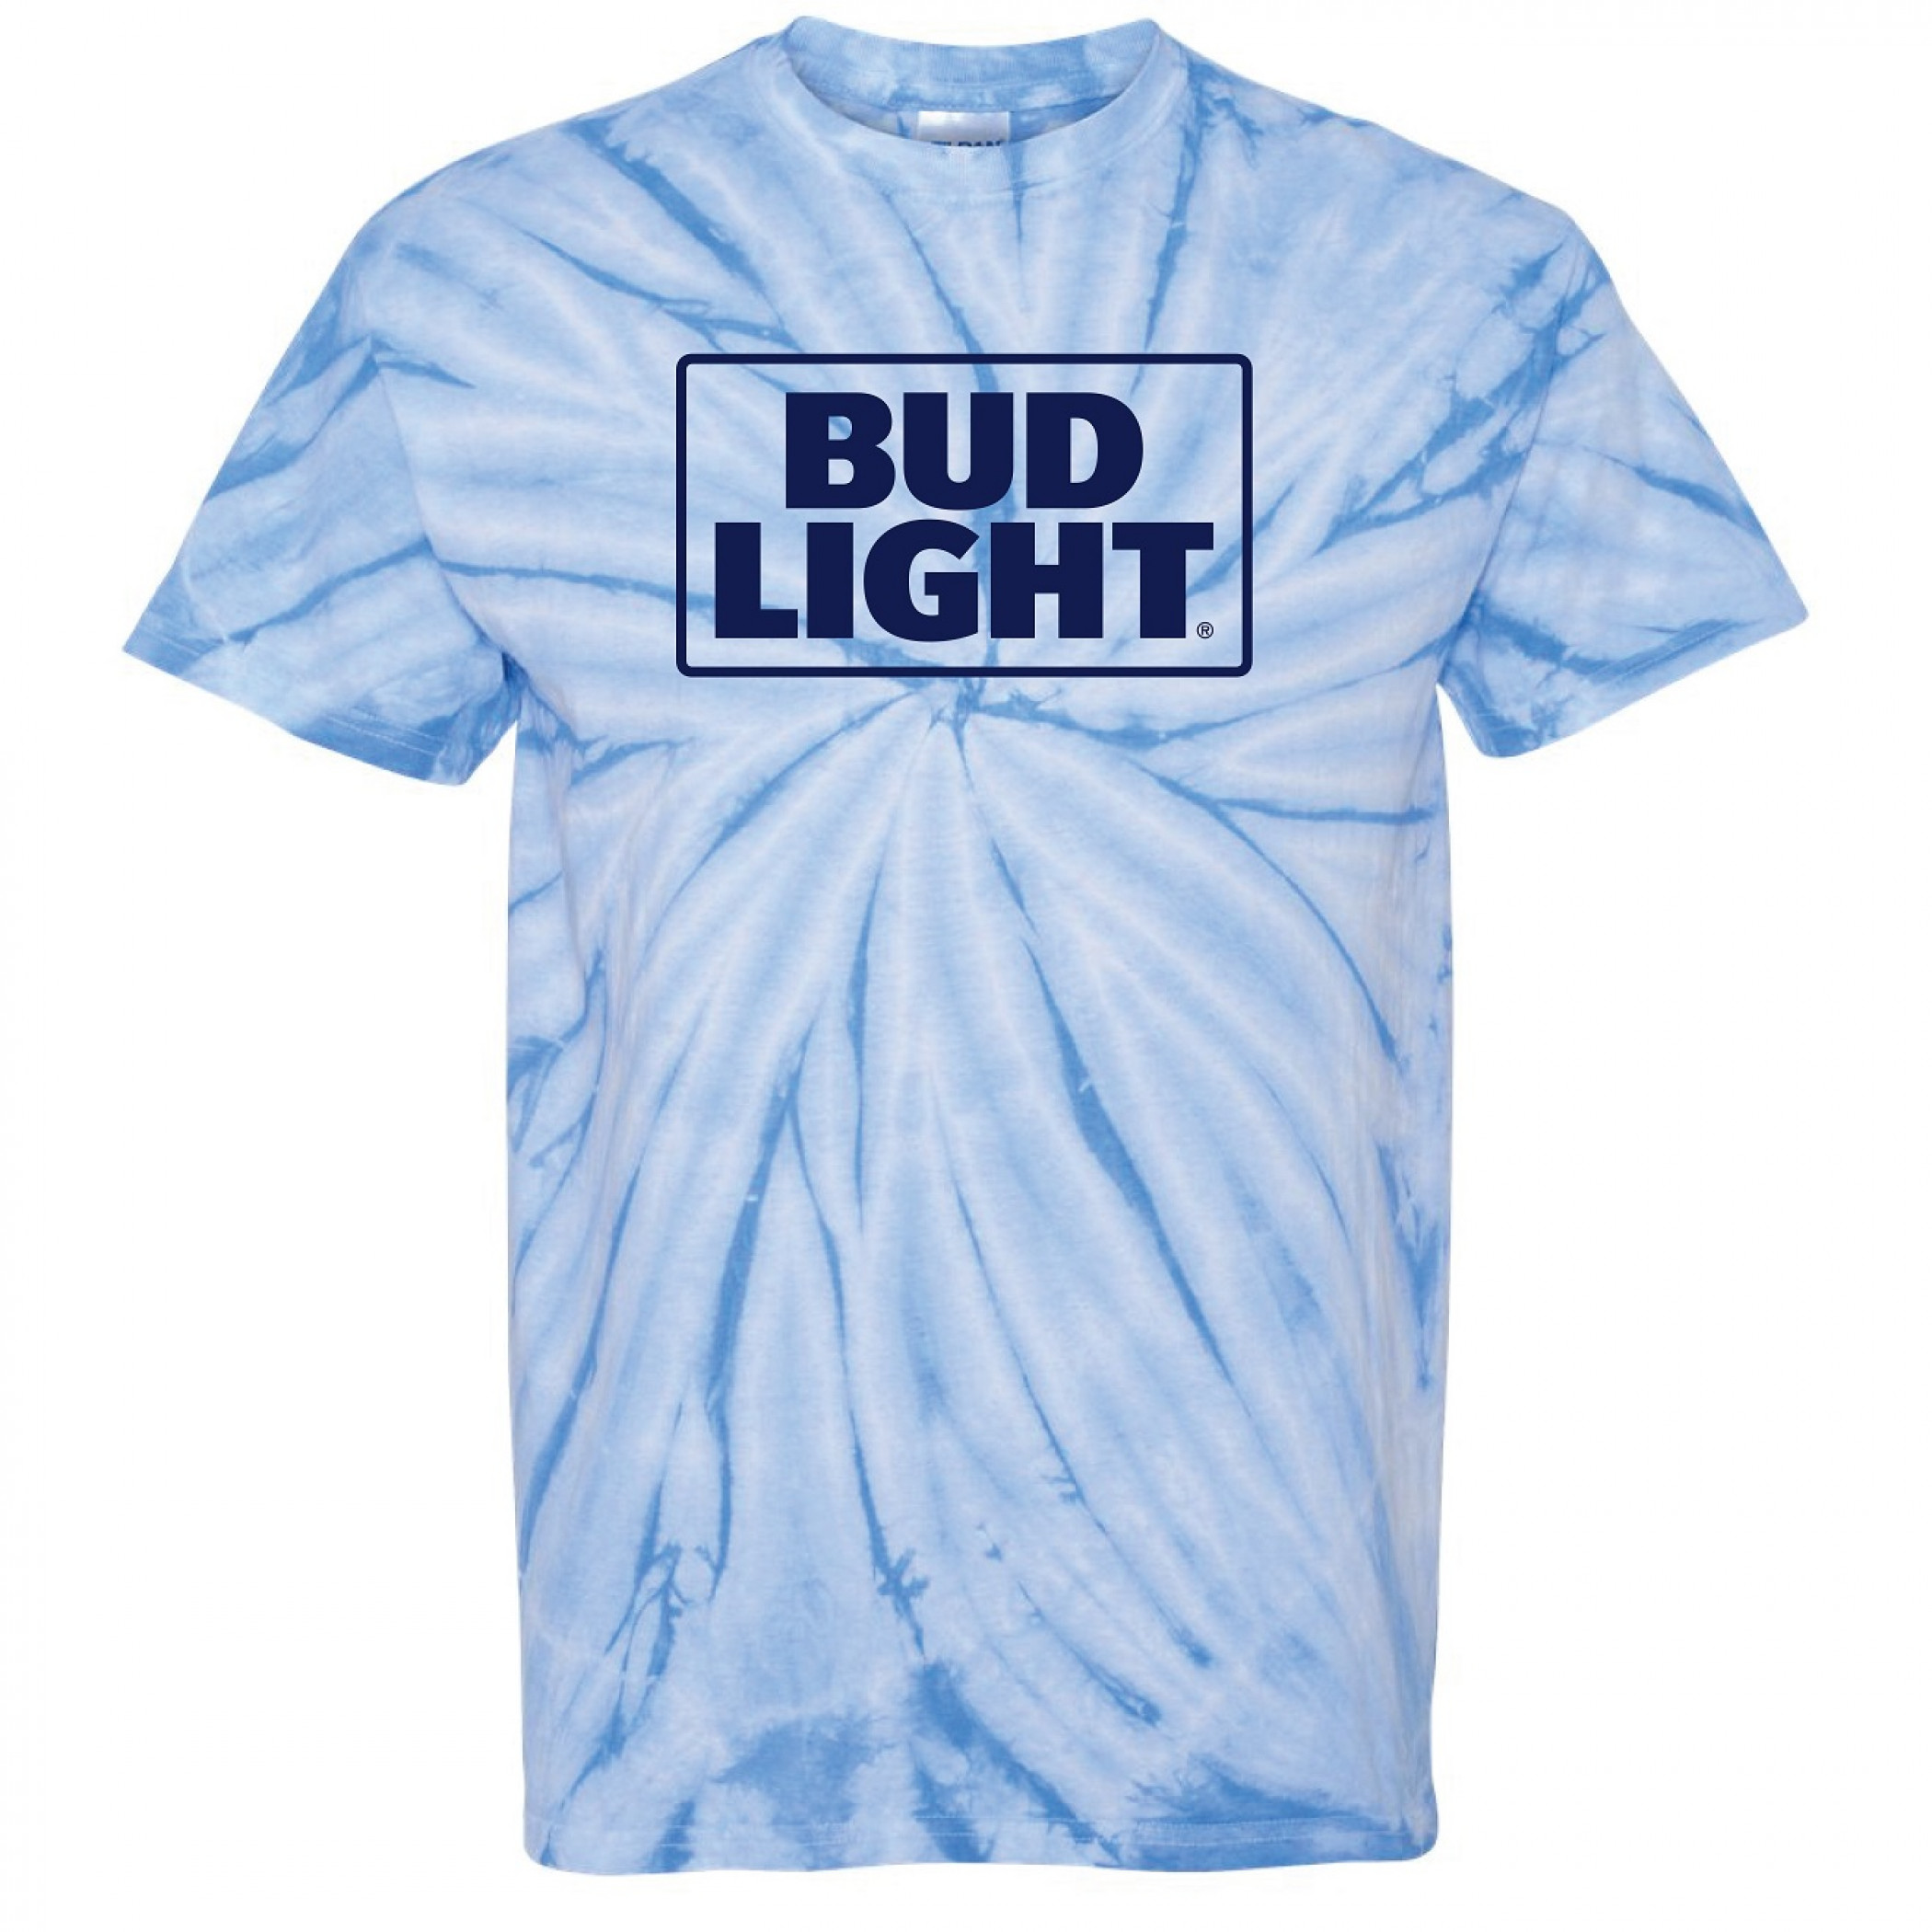 Bud Light Tie Dye T-Shirt